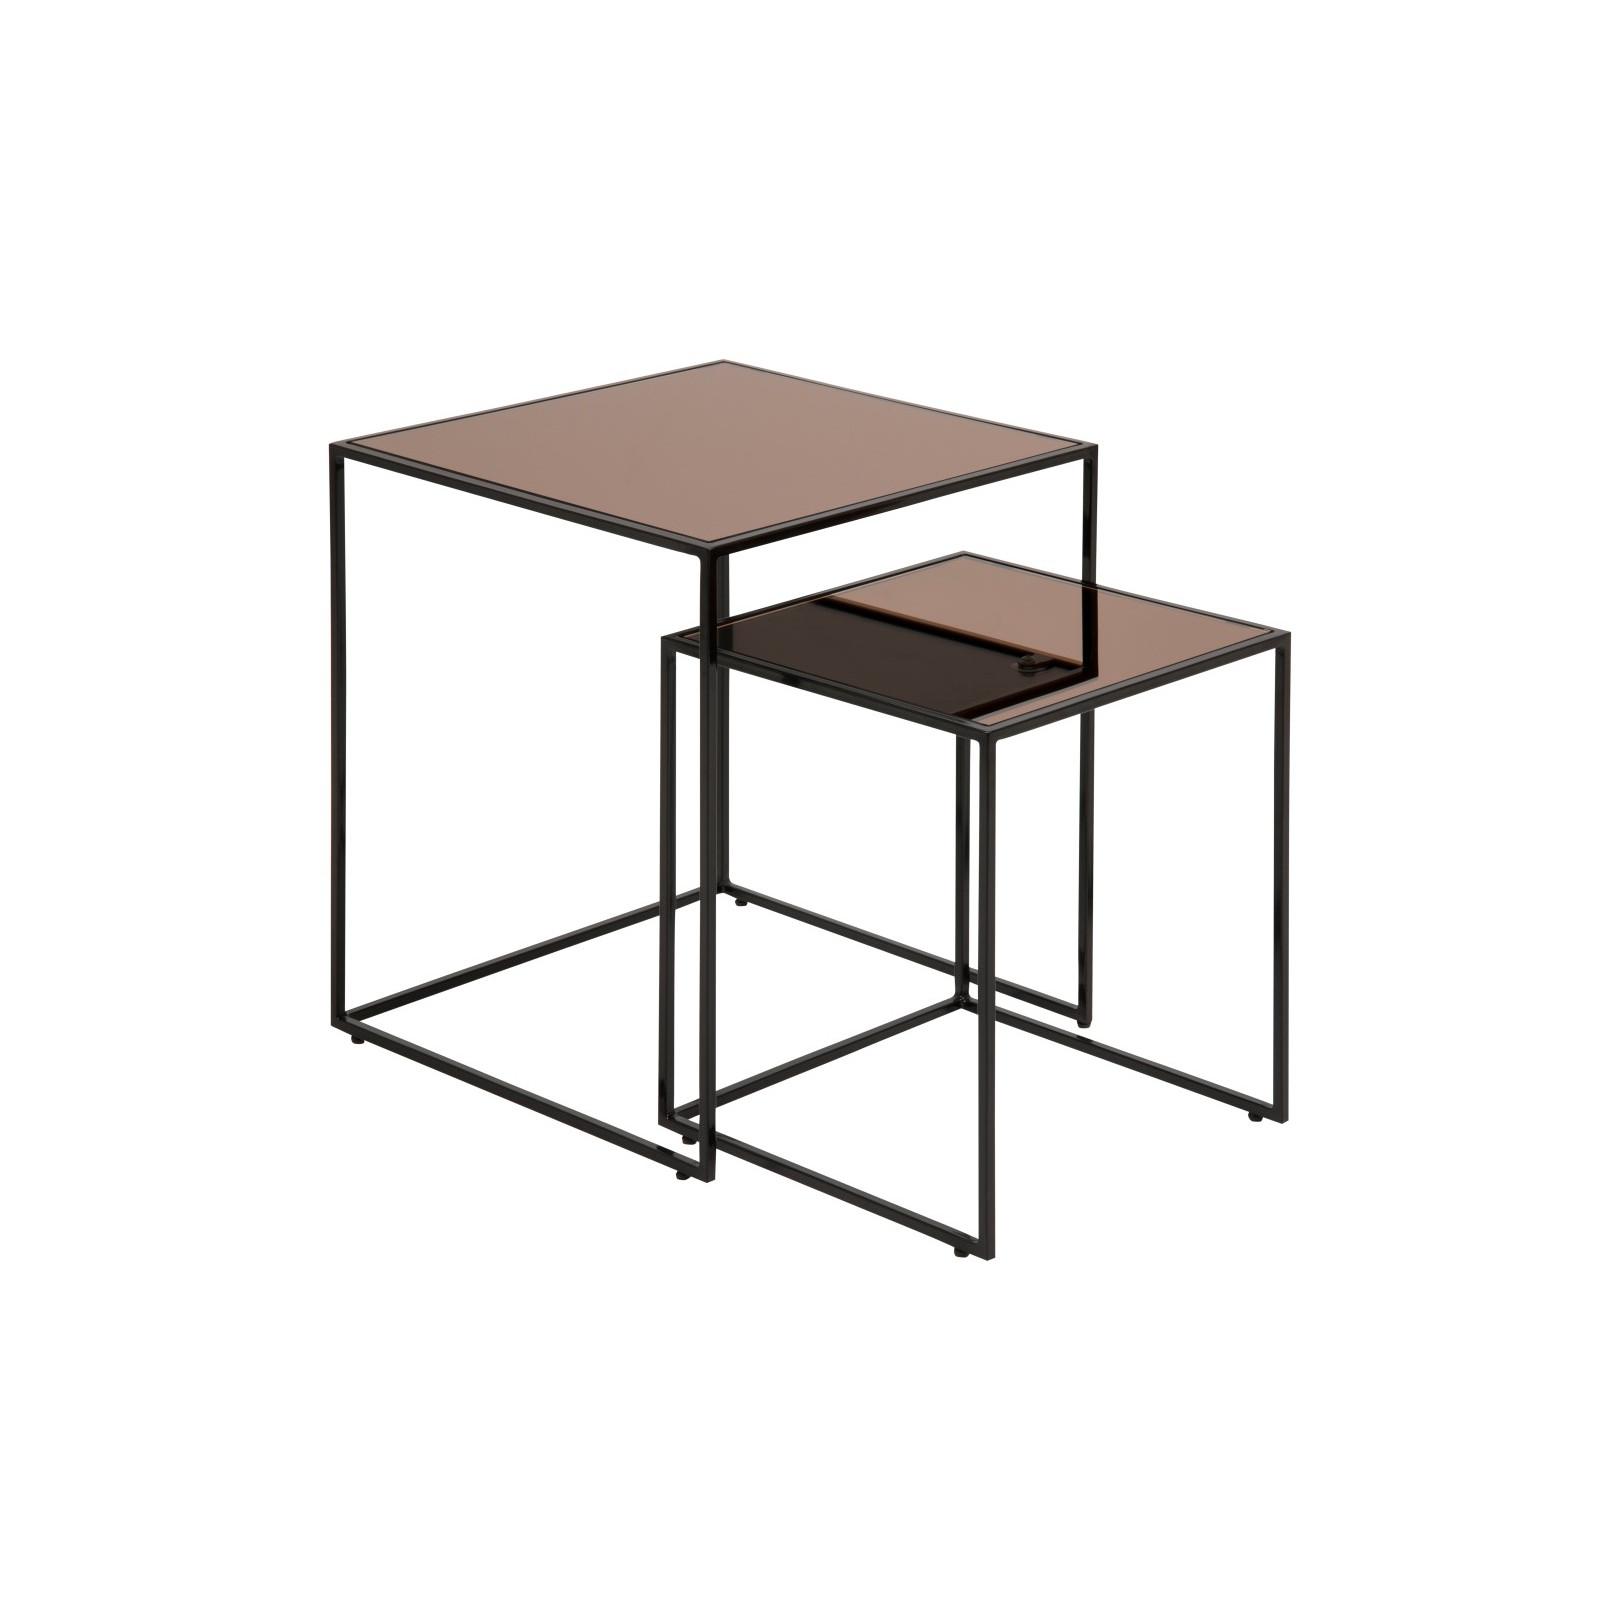 Set of 2 Coffee Tables Wilson | Bronze Mirror Glass